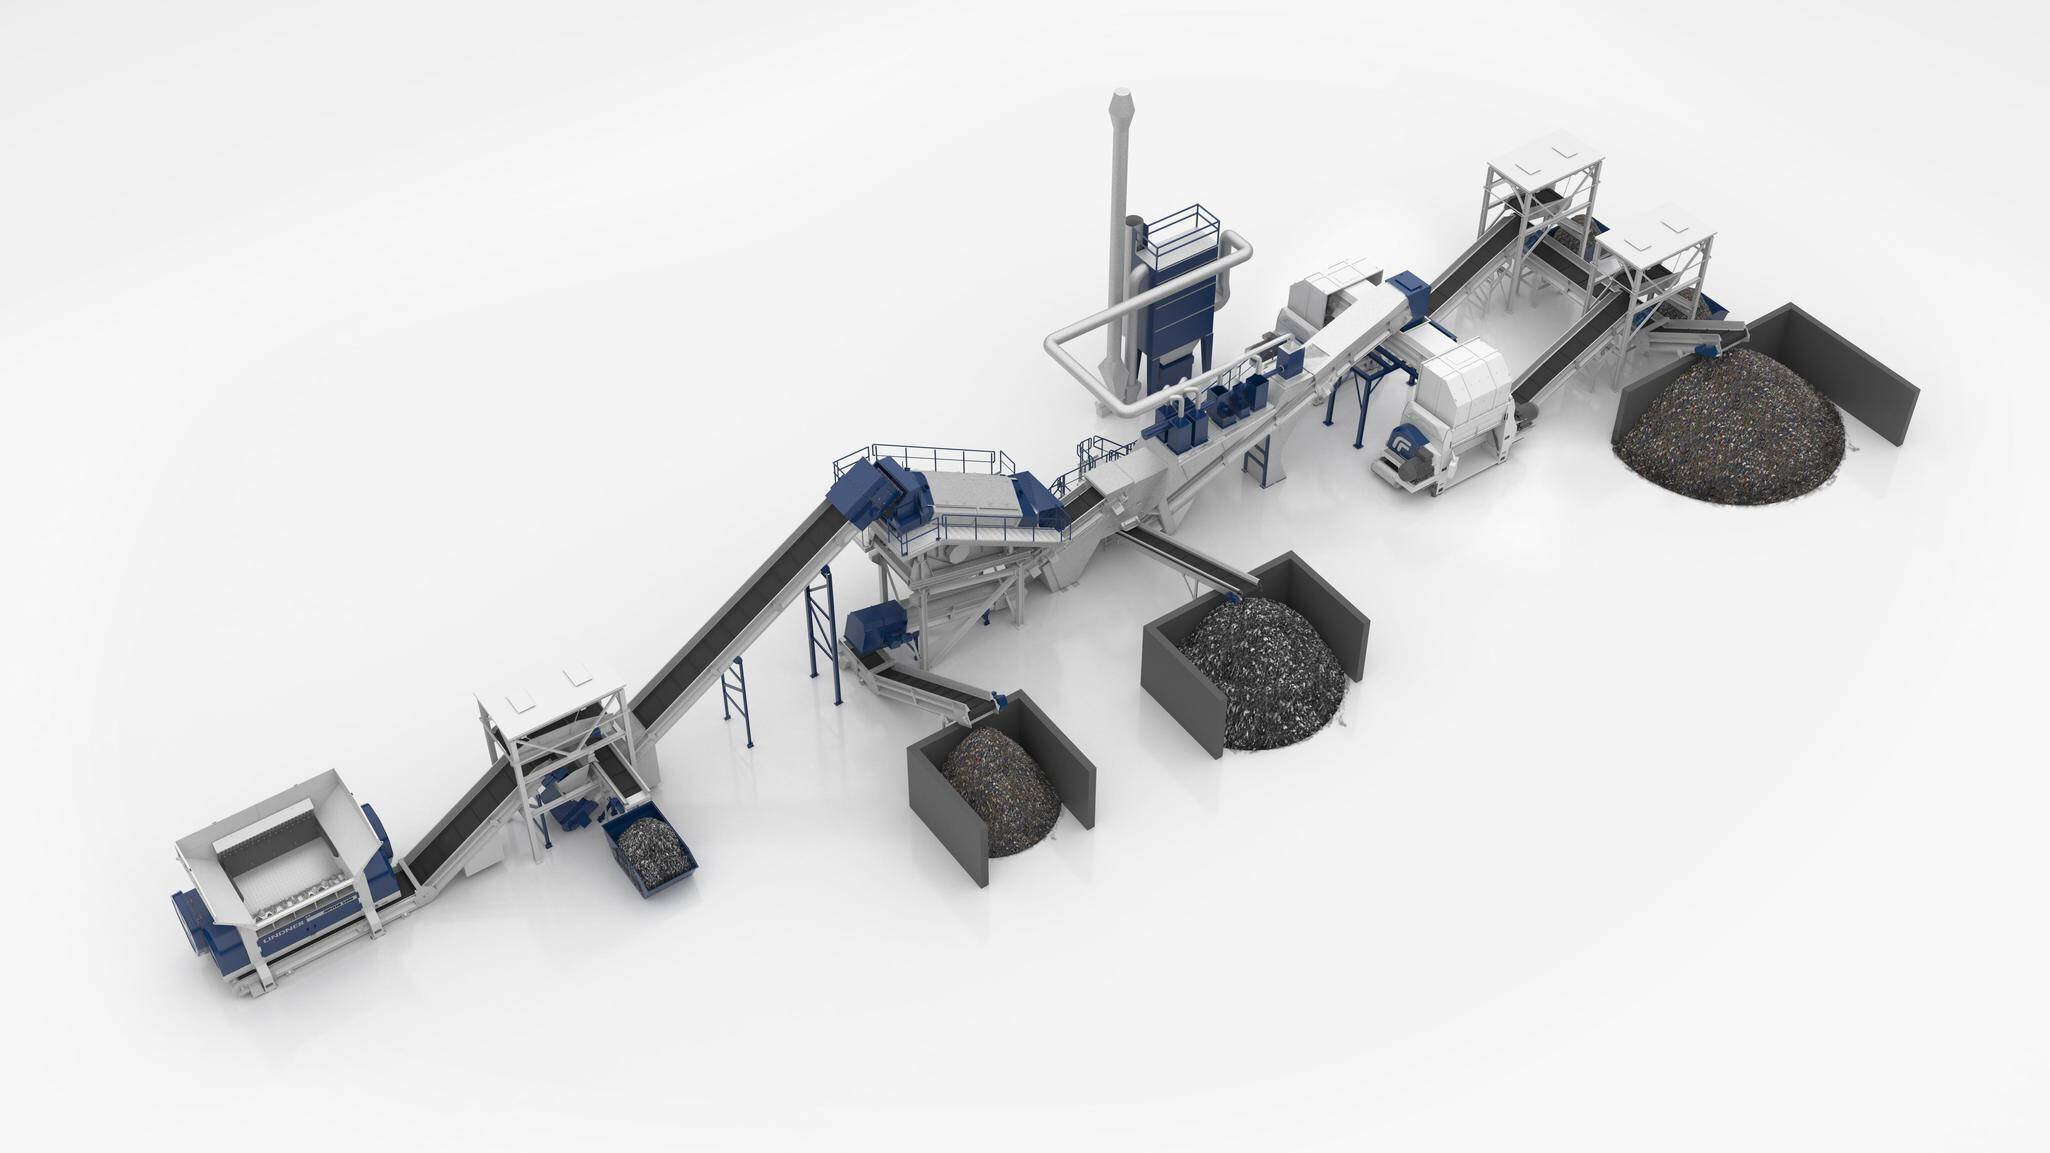 Gallery image 1 - System solution alternative fuel: SRF processing line